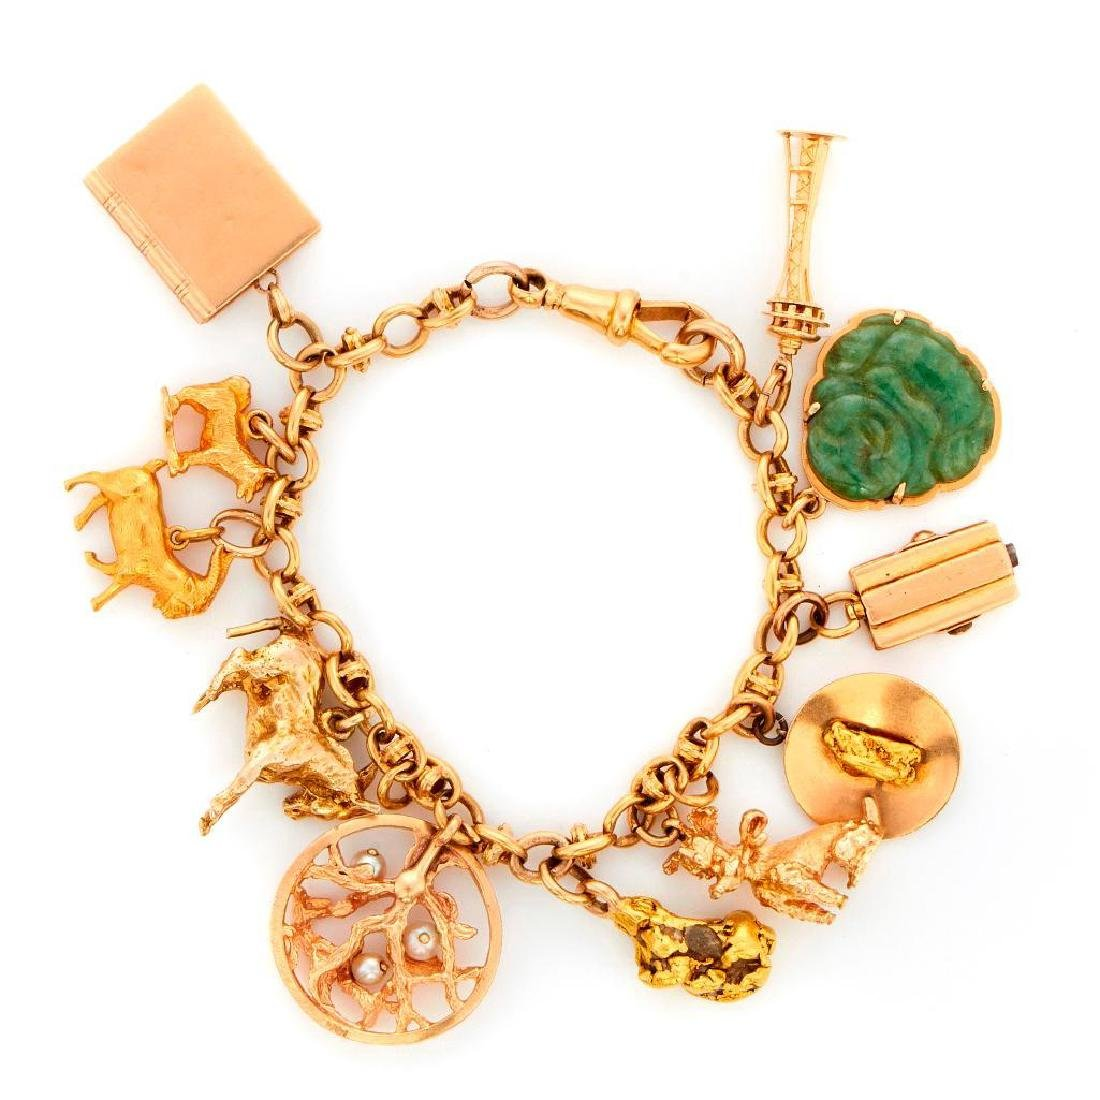 18k gold charm bracelet